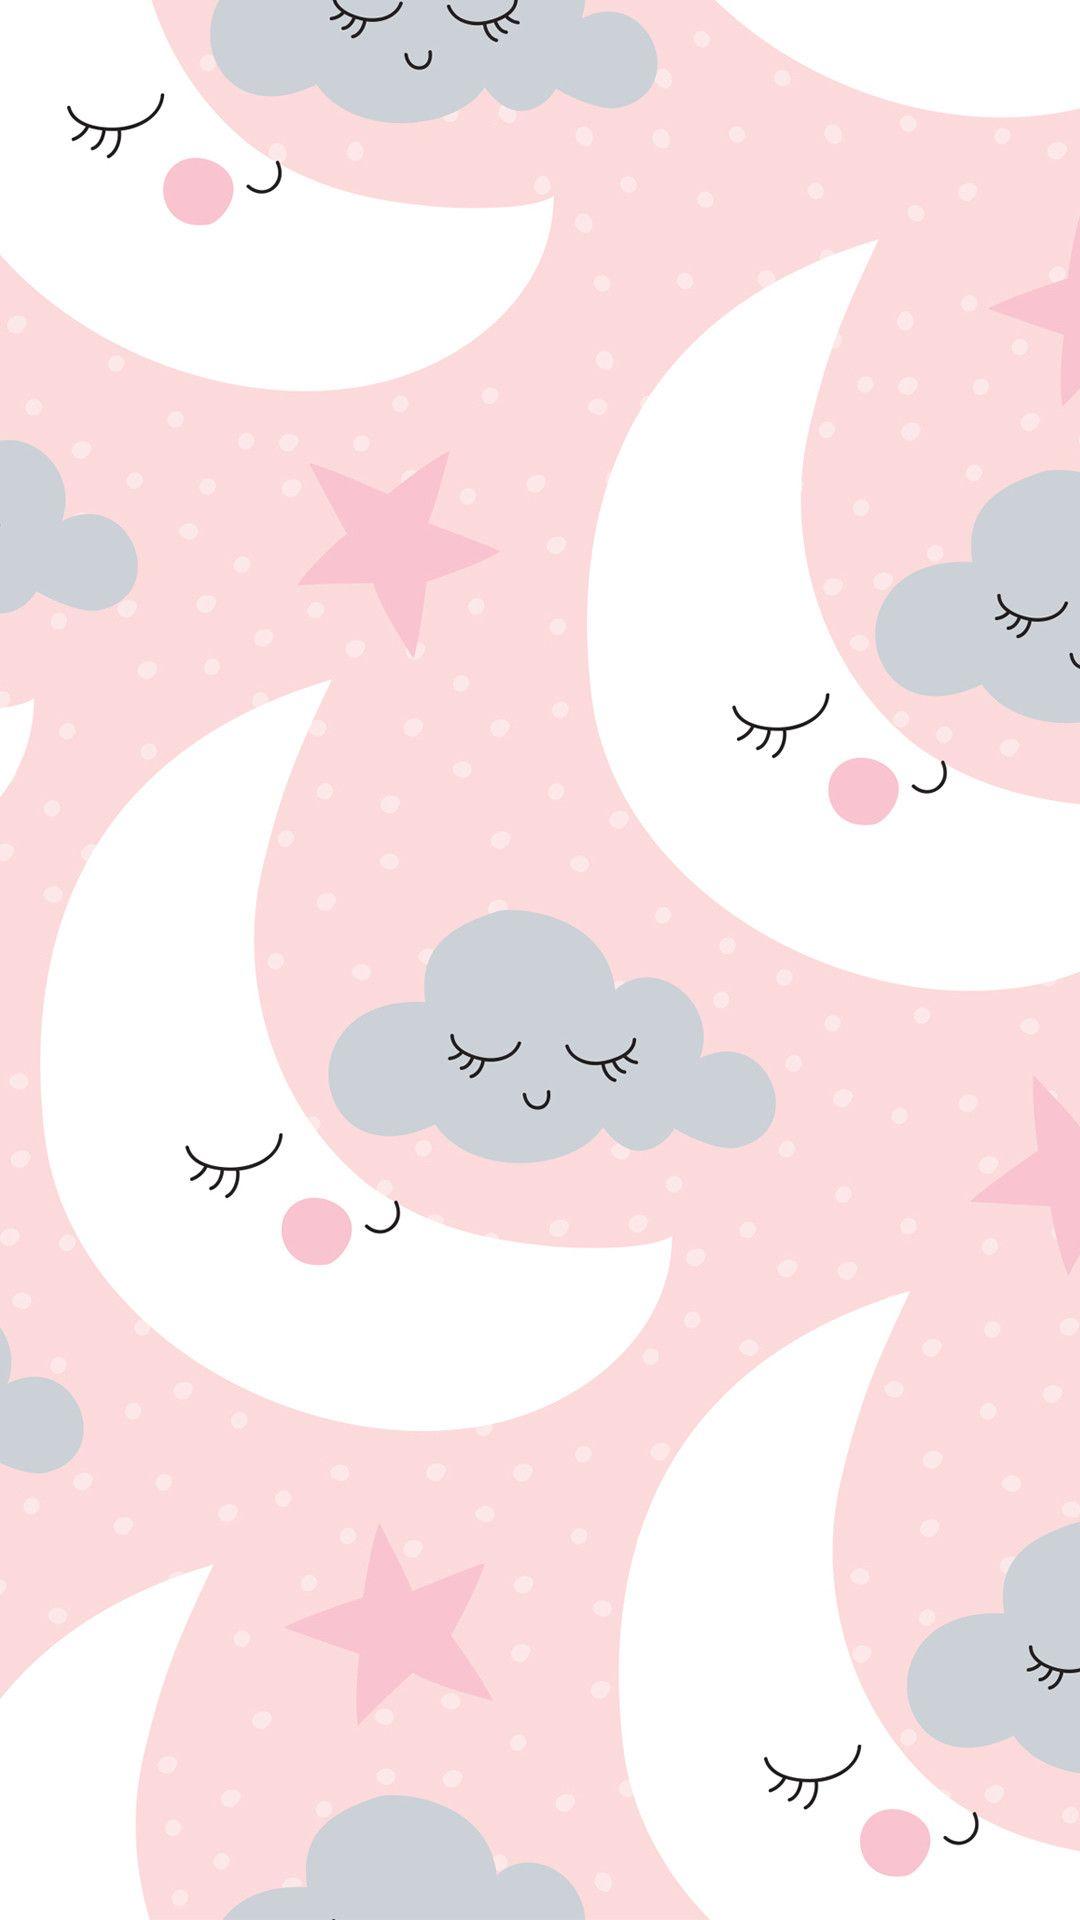 Cute Girly Wallpaper High Resolution Wallpaper Iphone Kartu